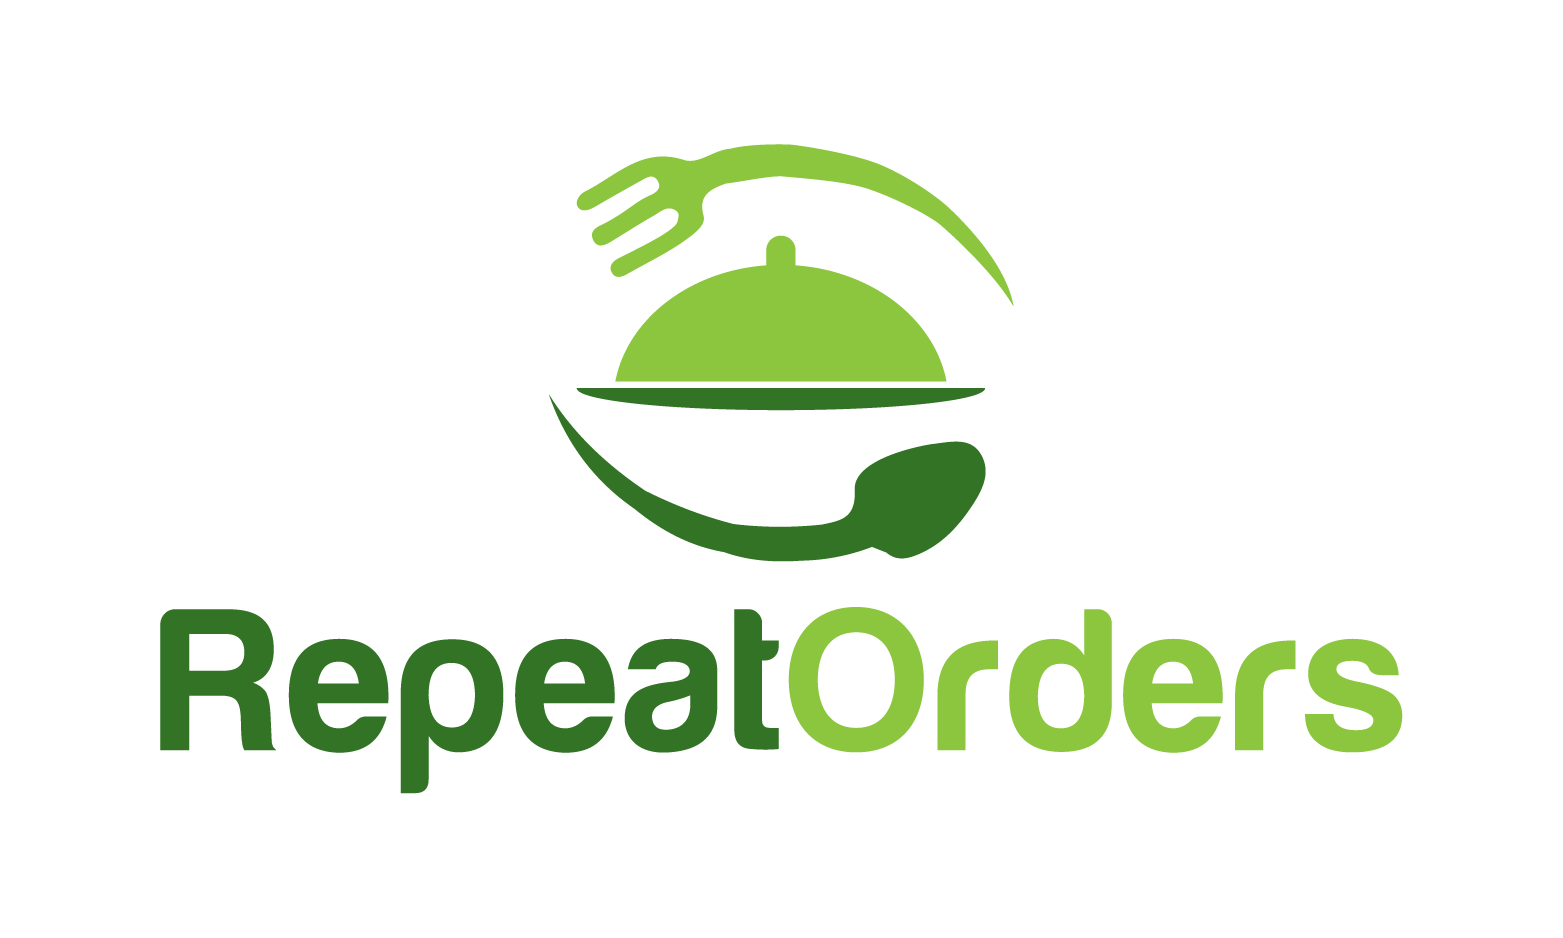 RepeatOrders.com